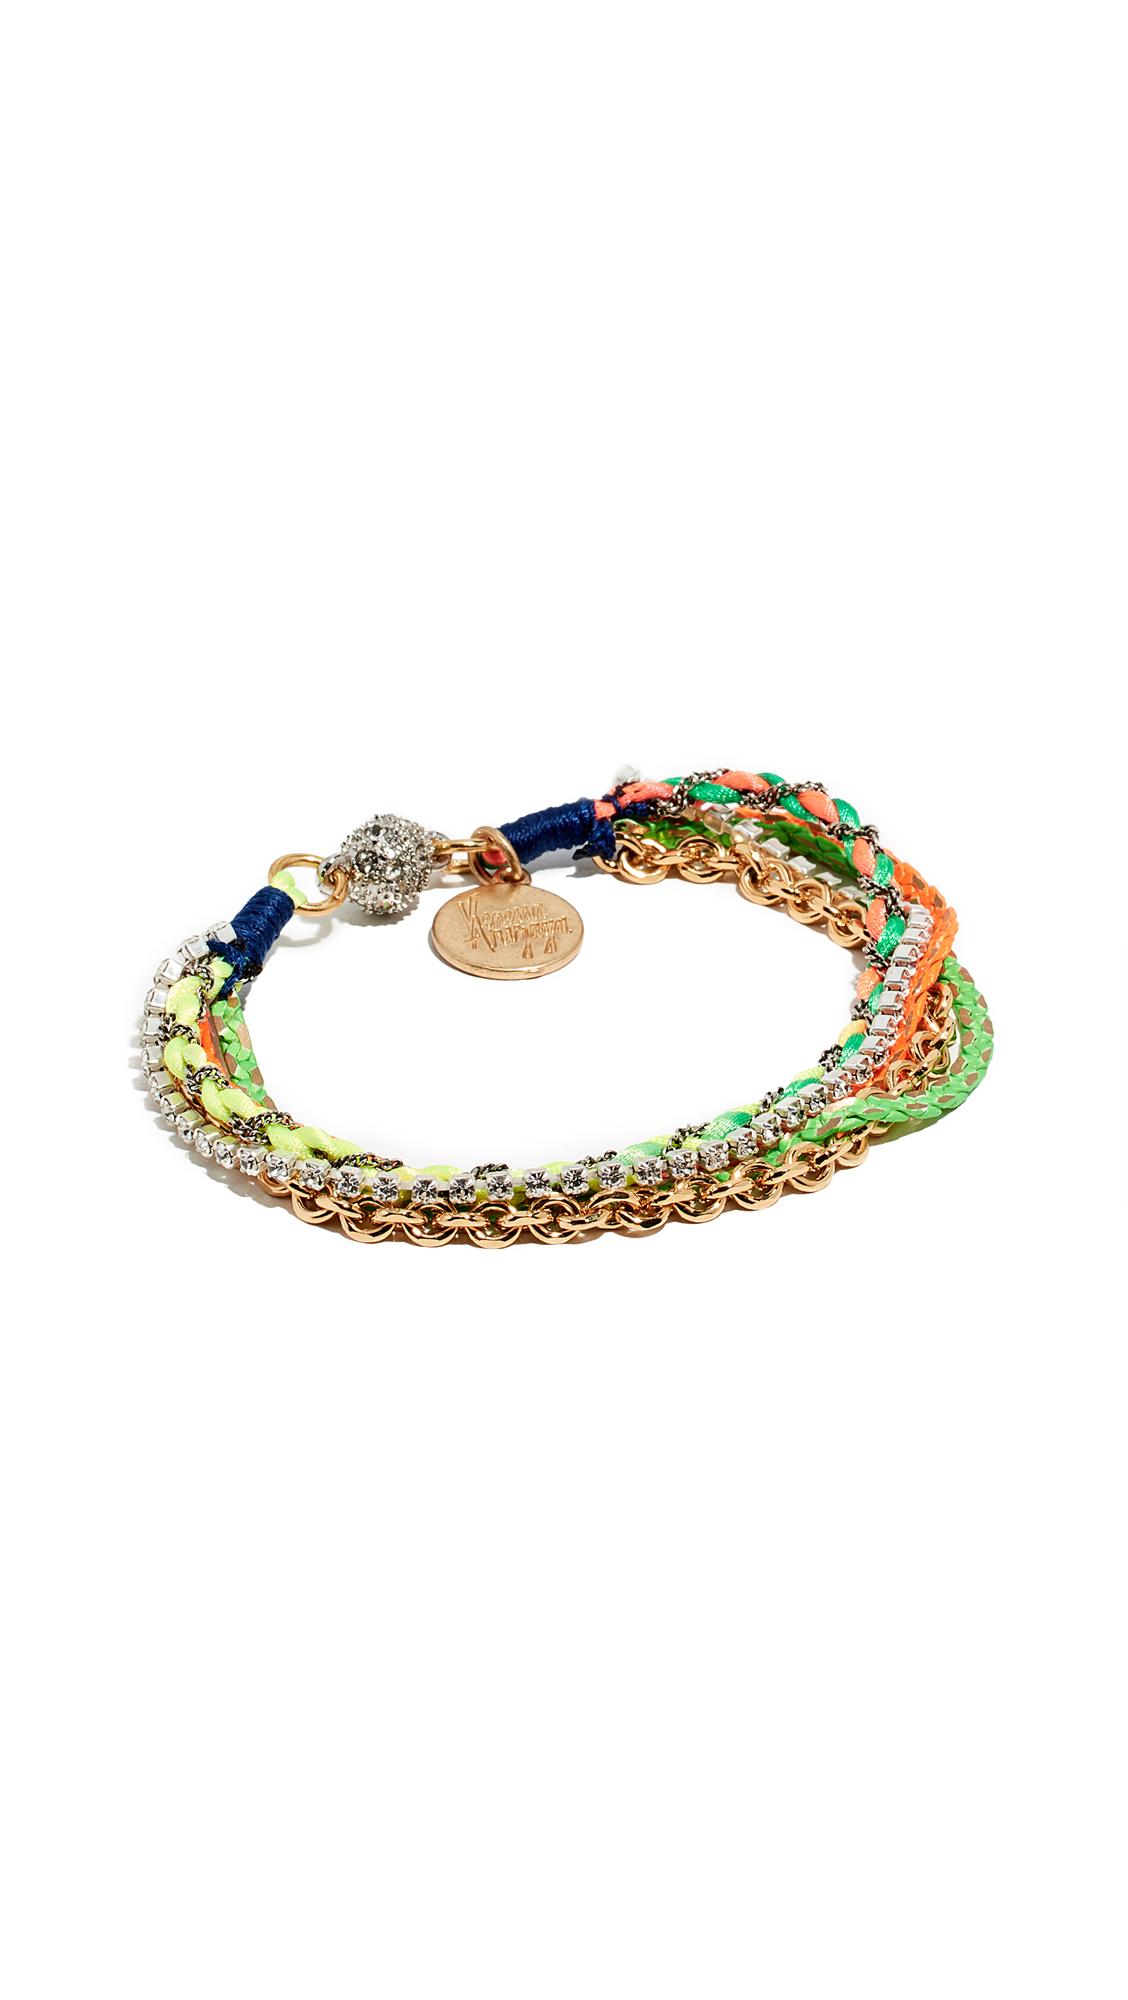 VENESSA ARIZAGA She'S A Rainbow Bracelet in Multi